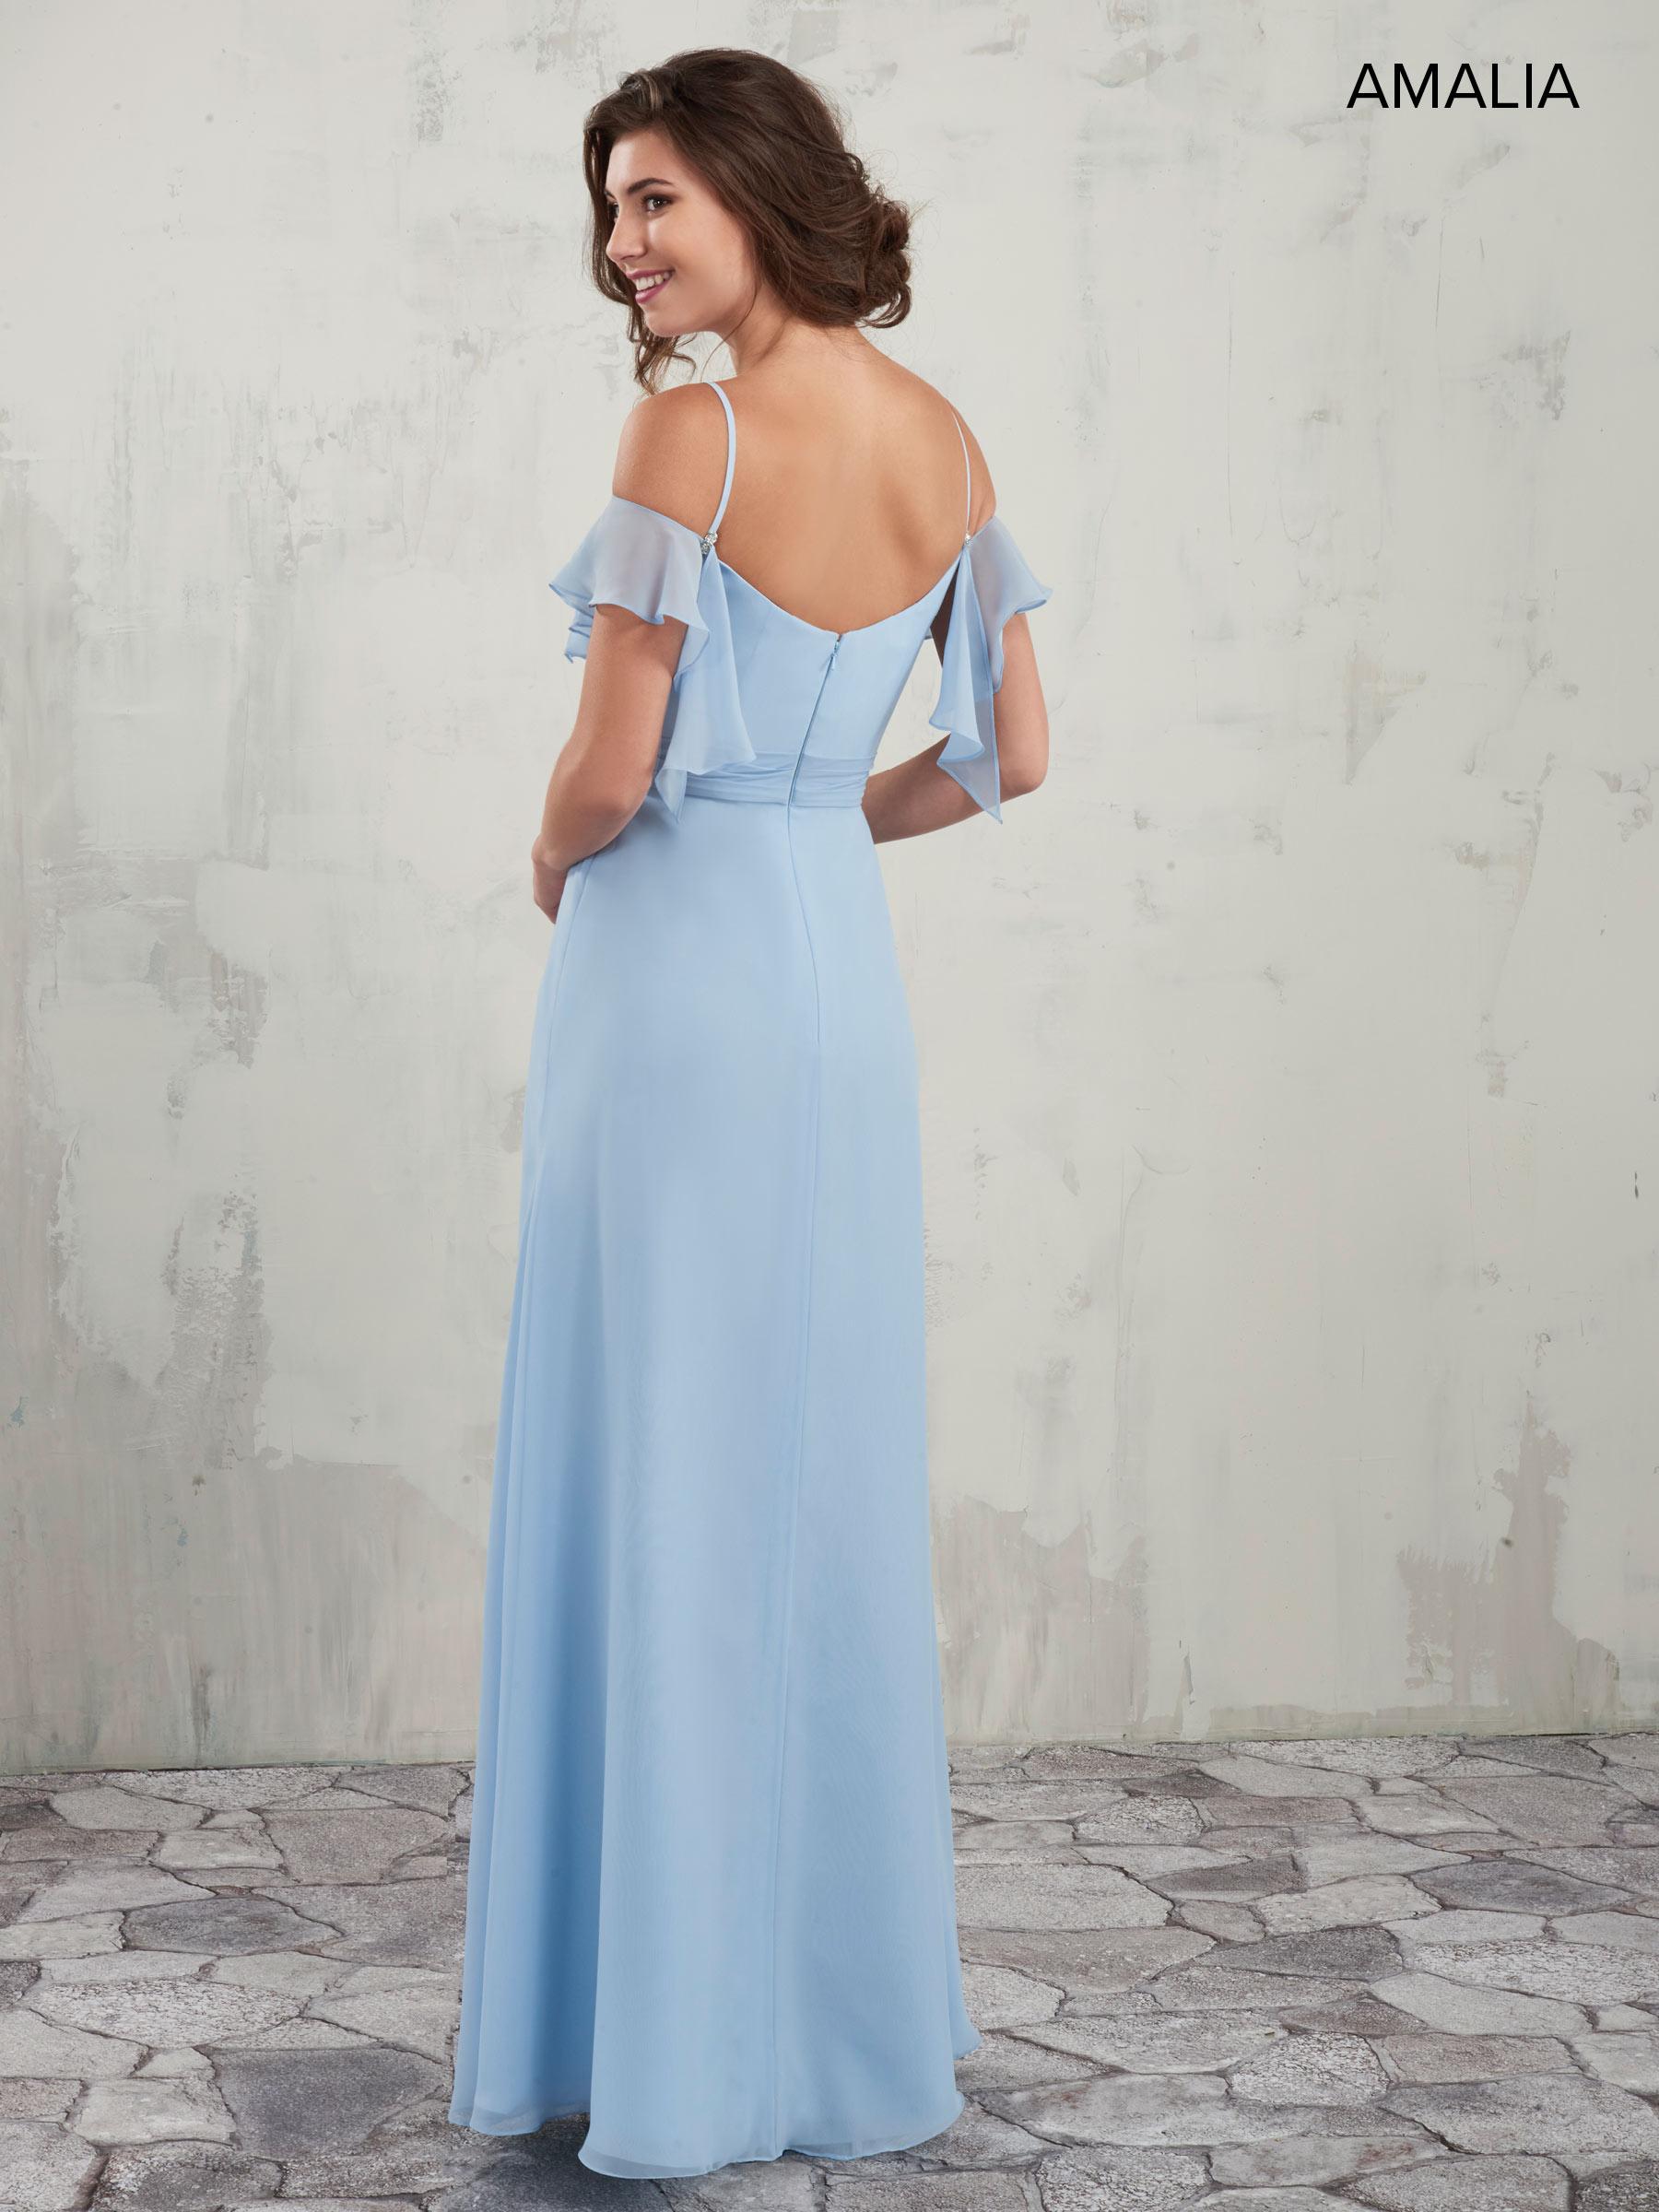 Amalia Bridesmaid Dresses | Amalia | Style - MB7010